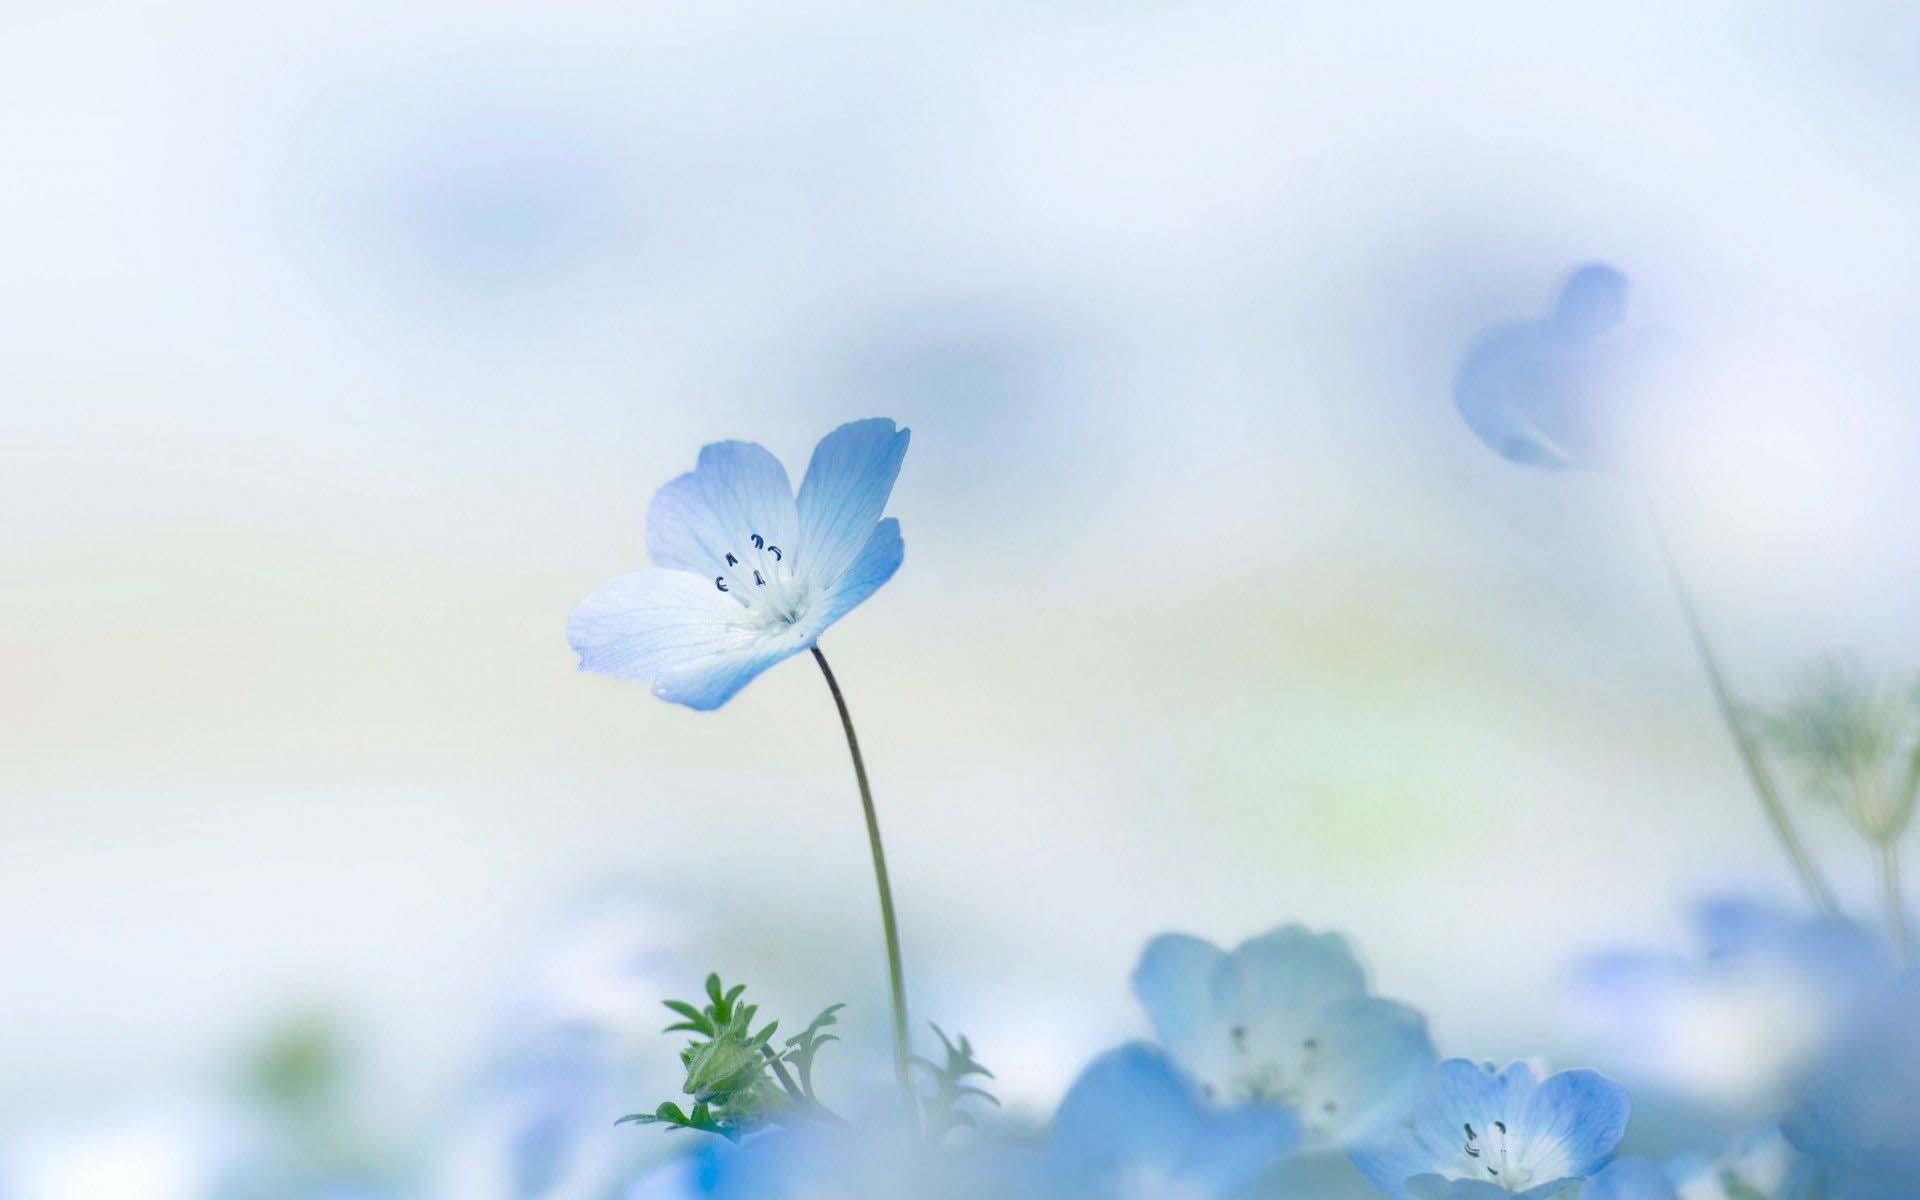 Wallpaper hd flower